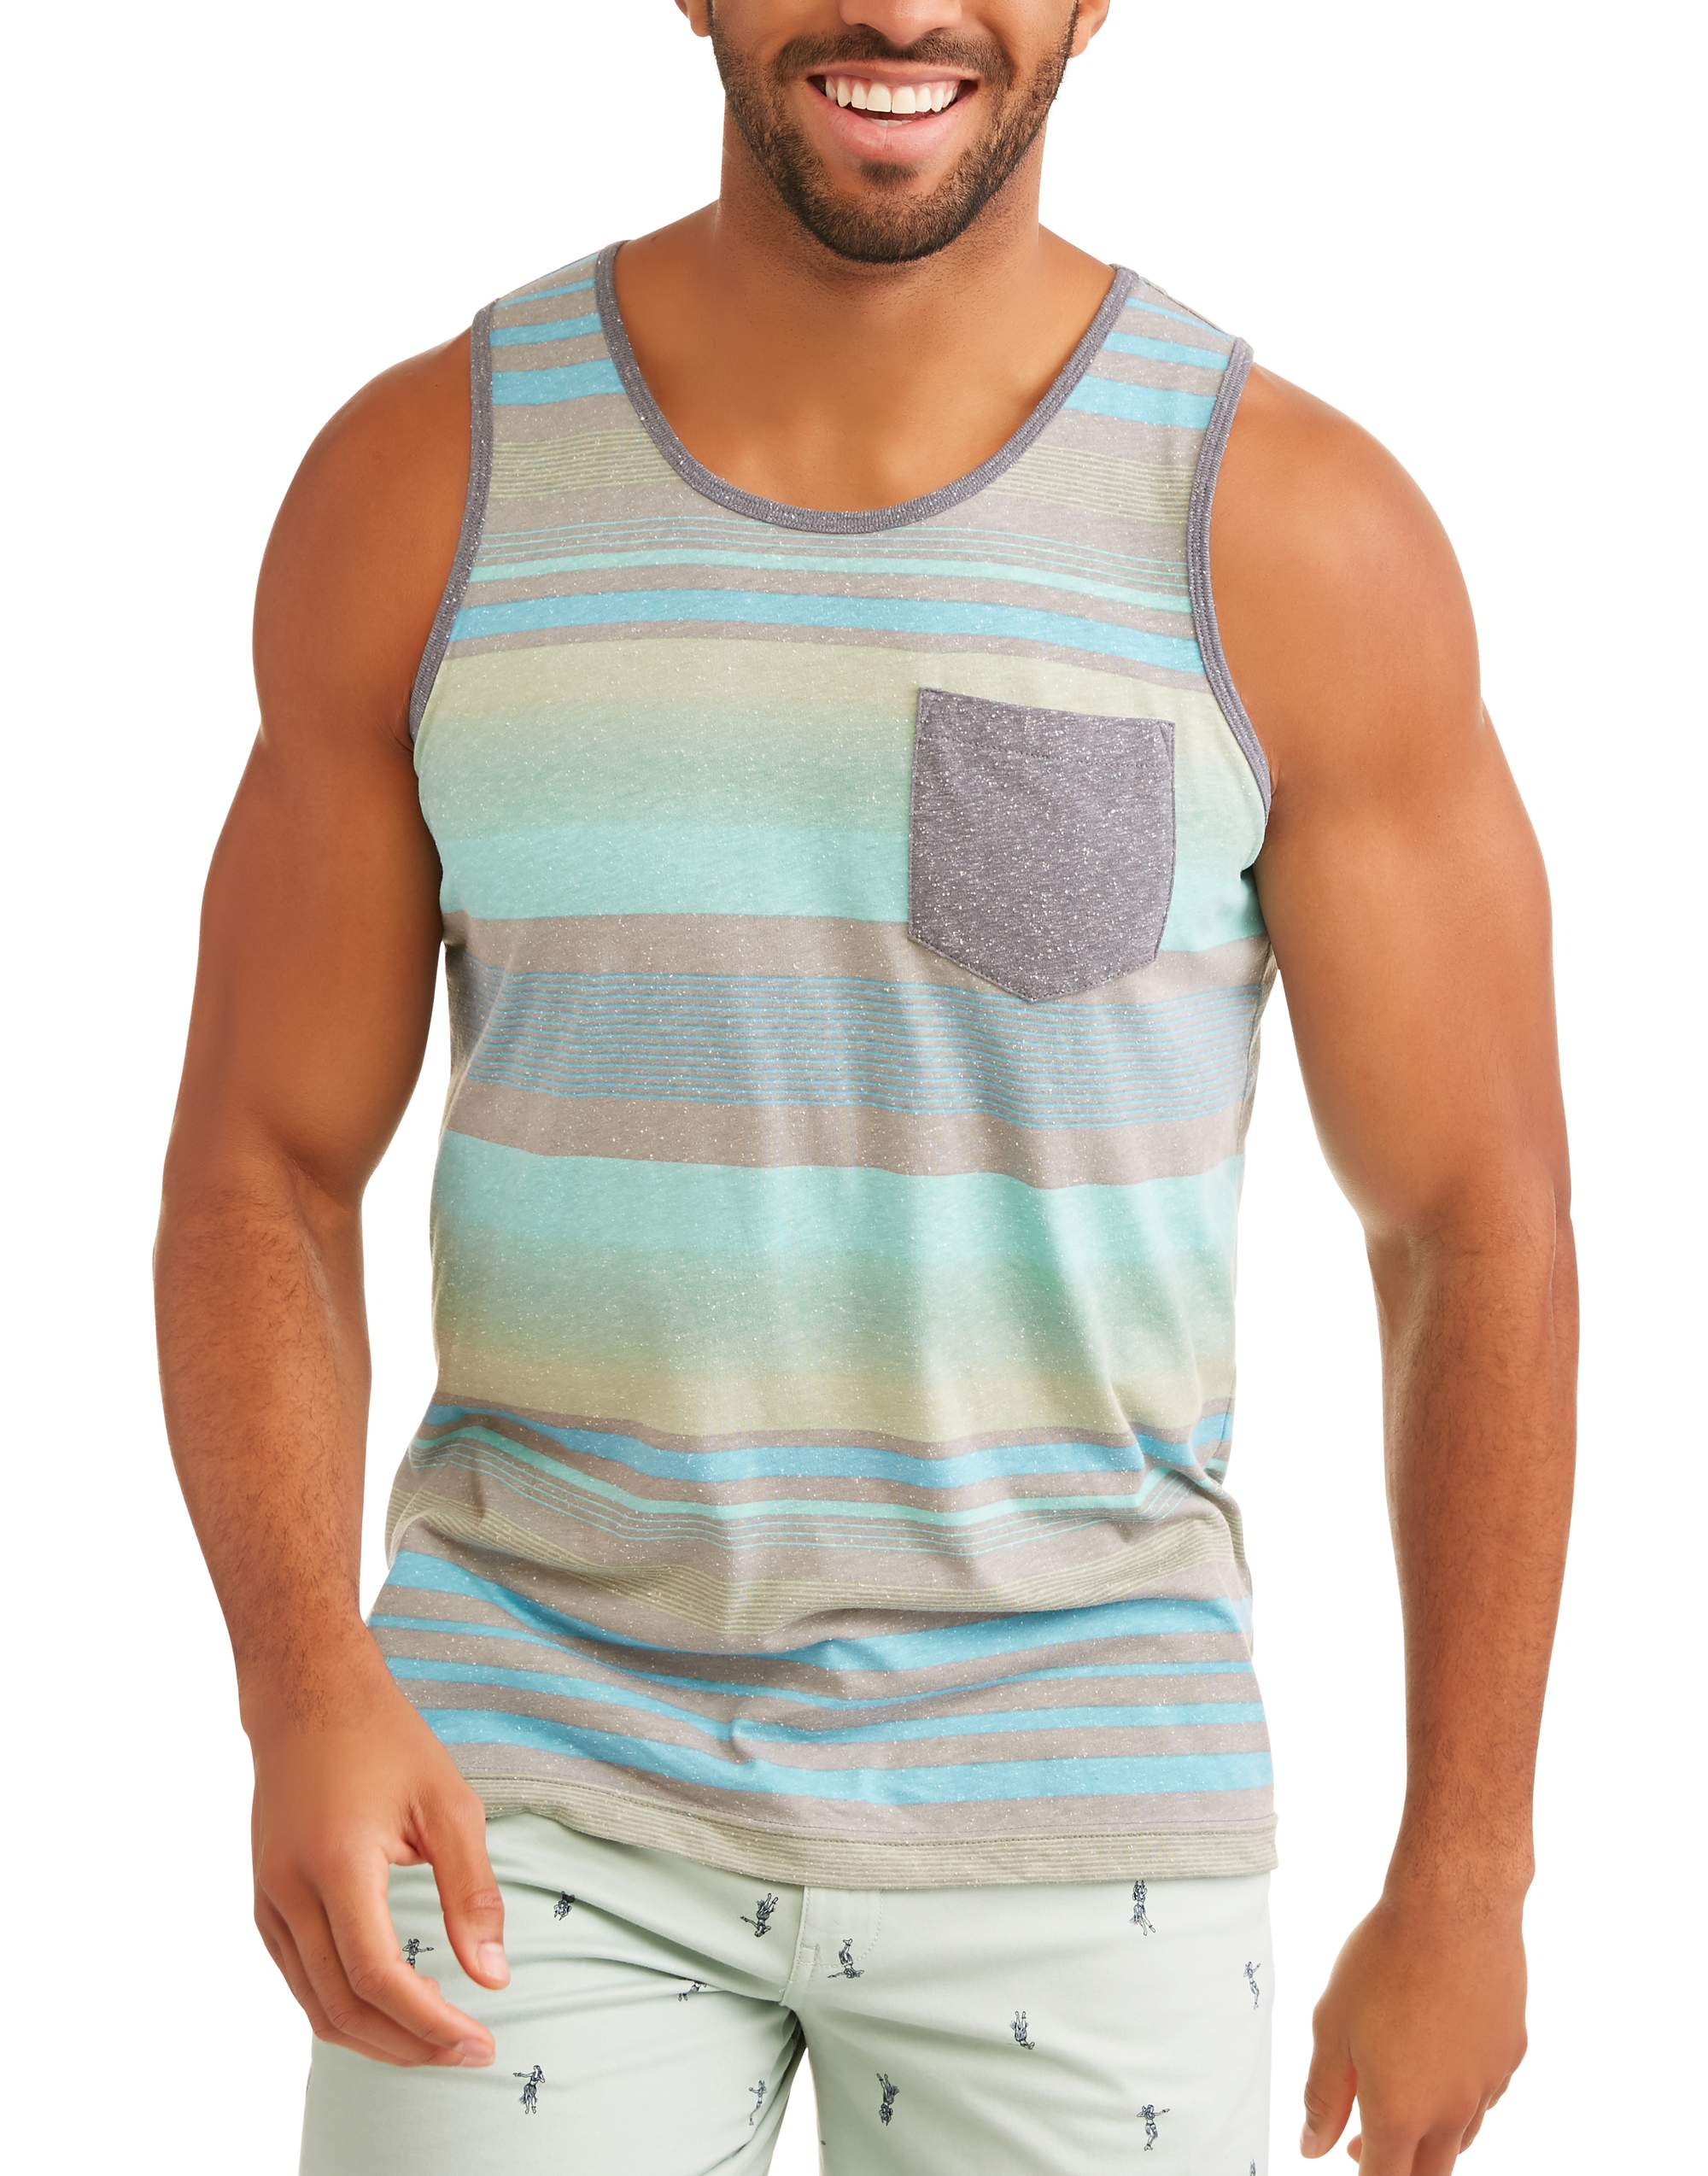 Big Men's Stripe Tank Top With Pocket